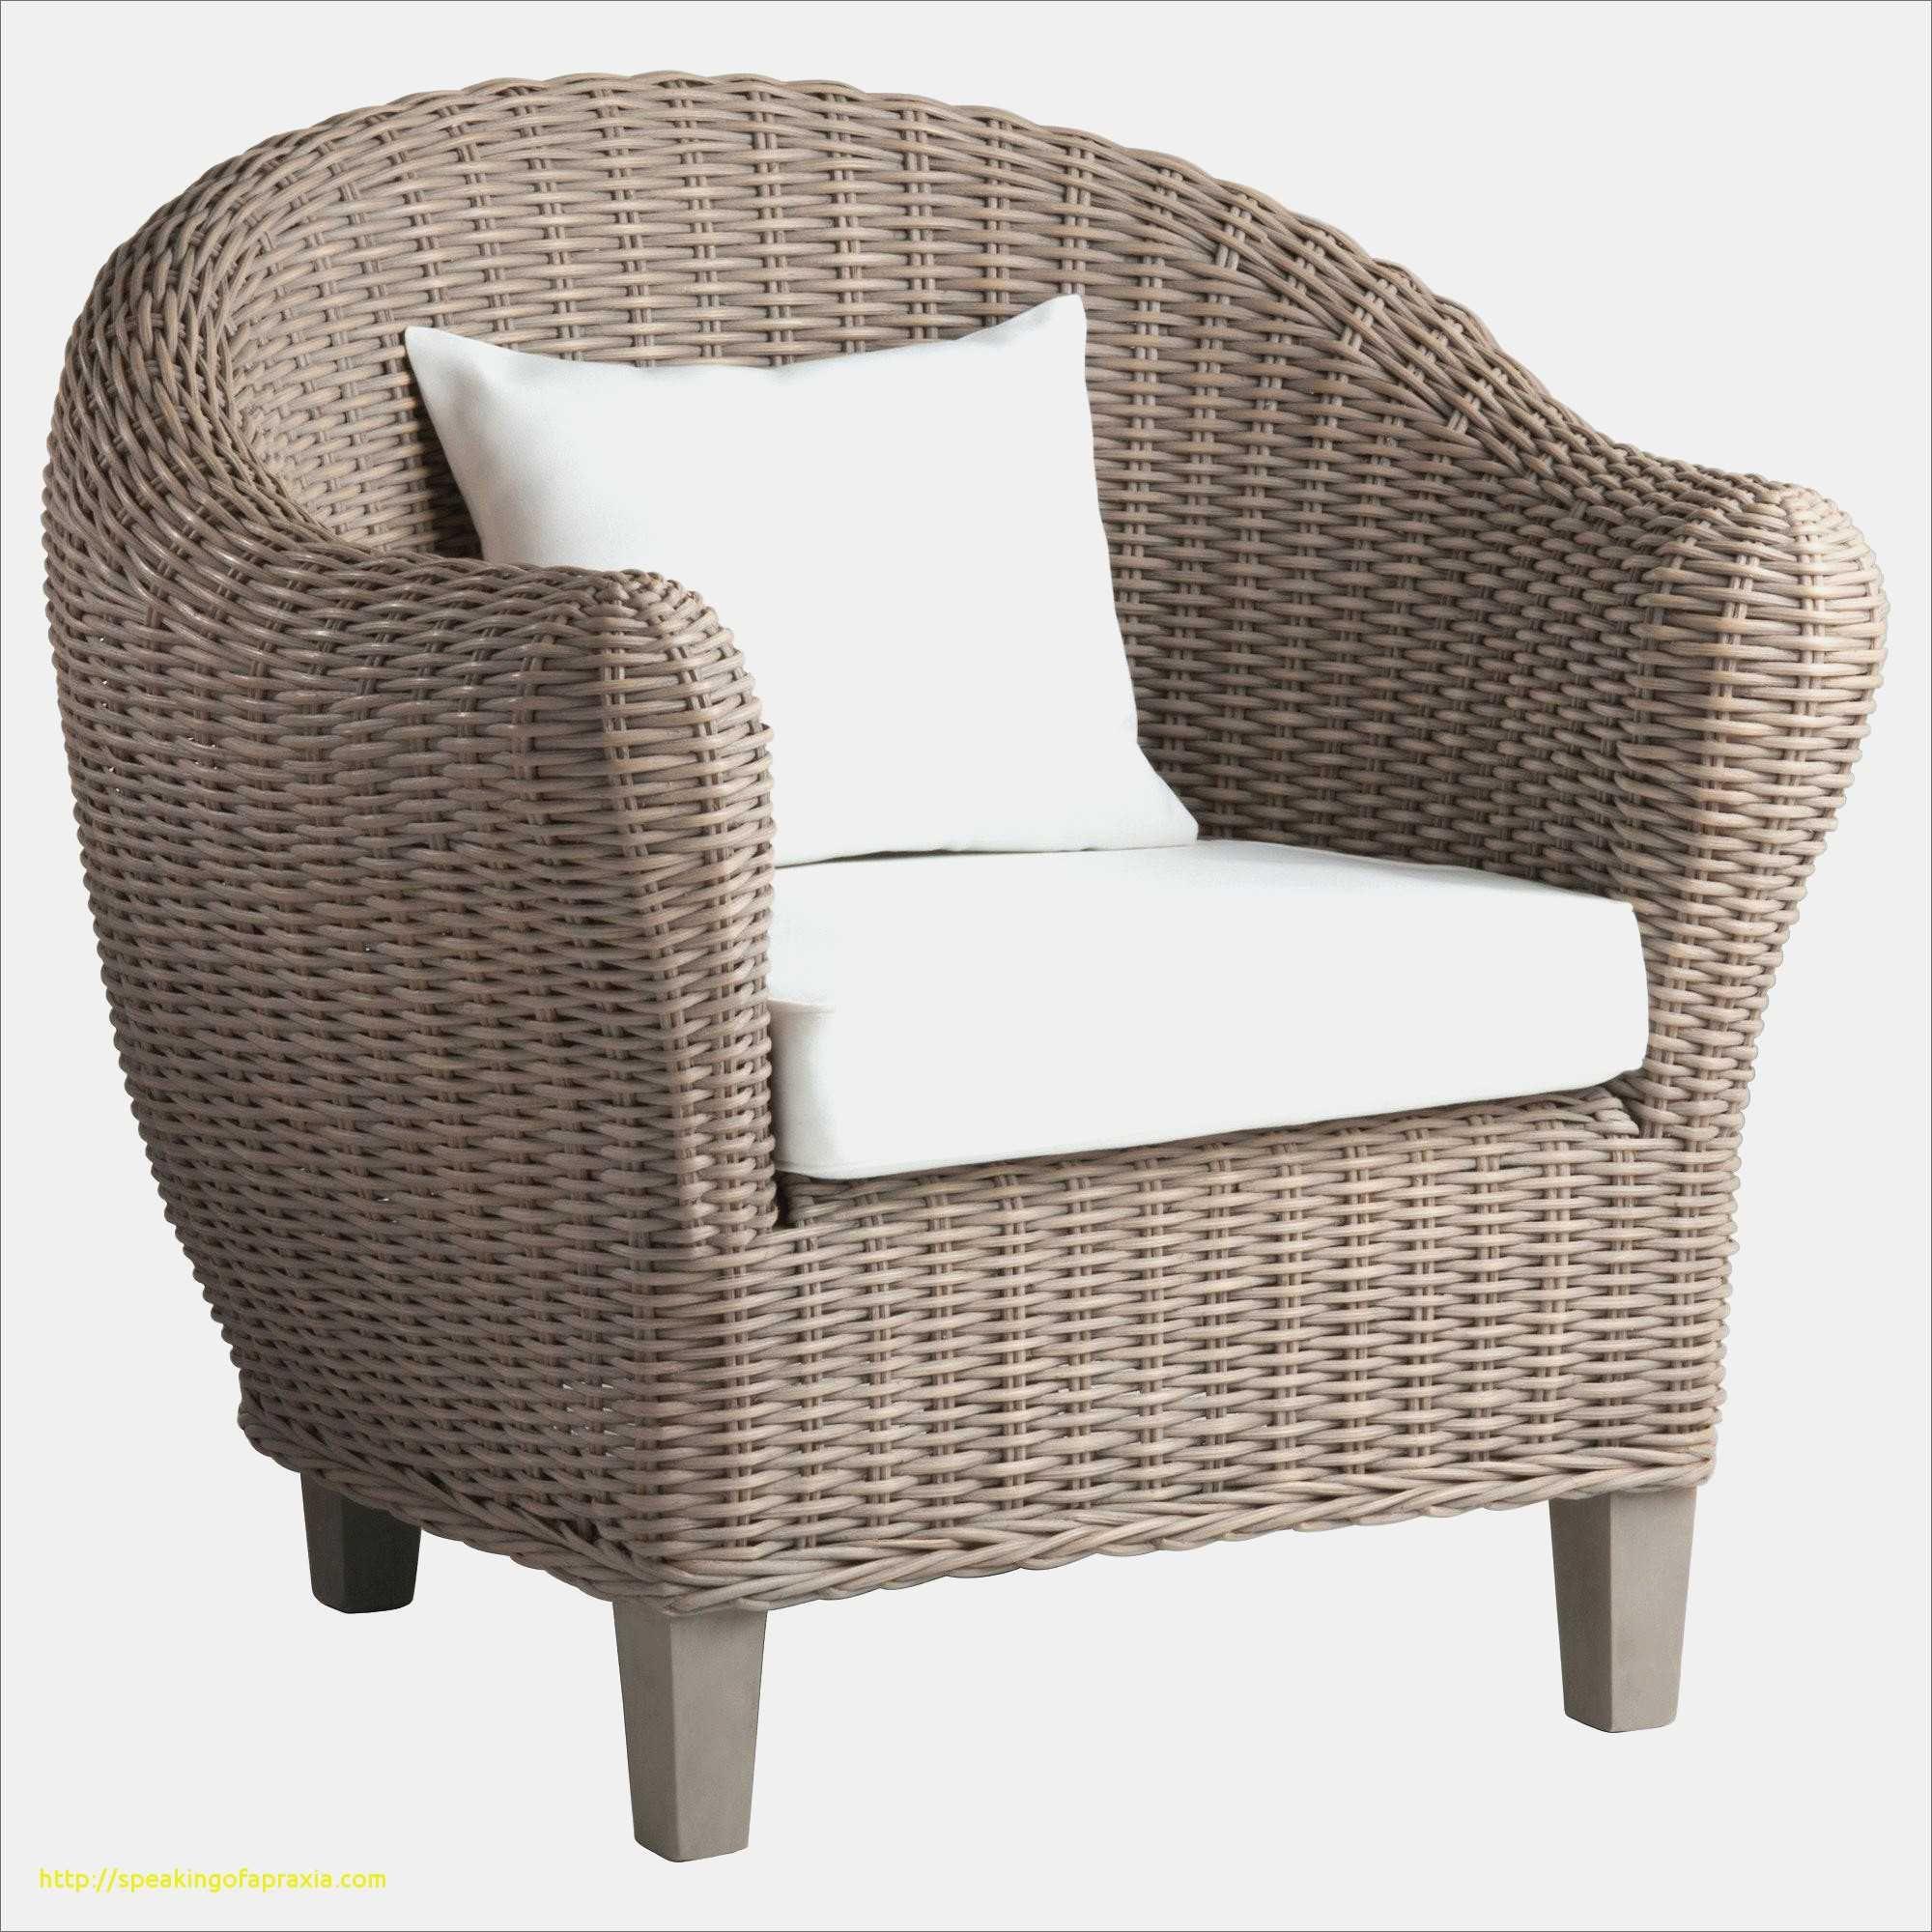 fauteuil rotin fauteuil ikea chaise osier